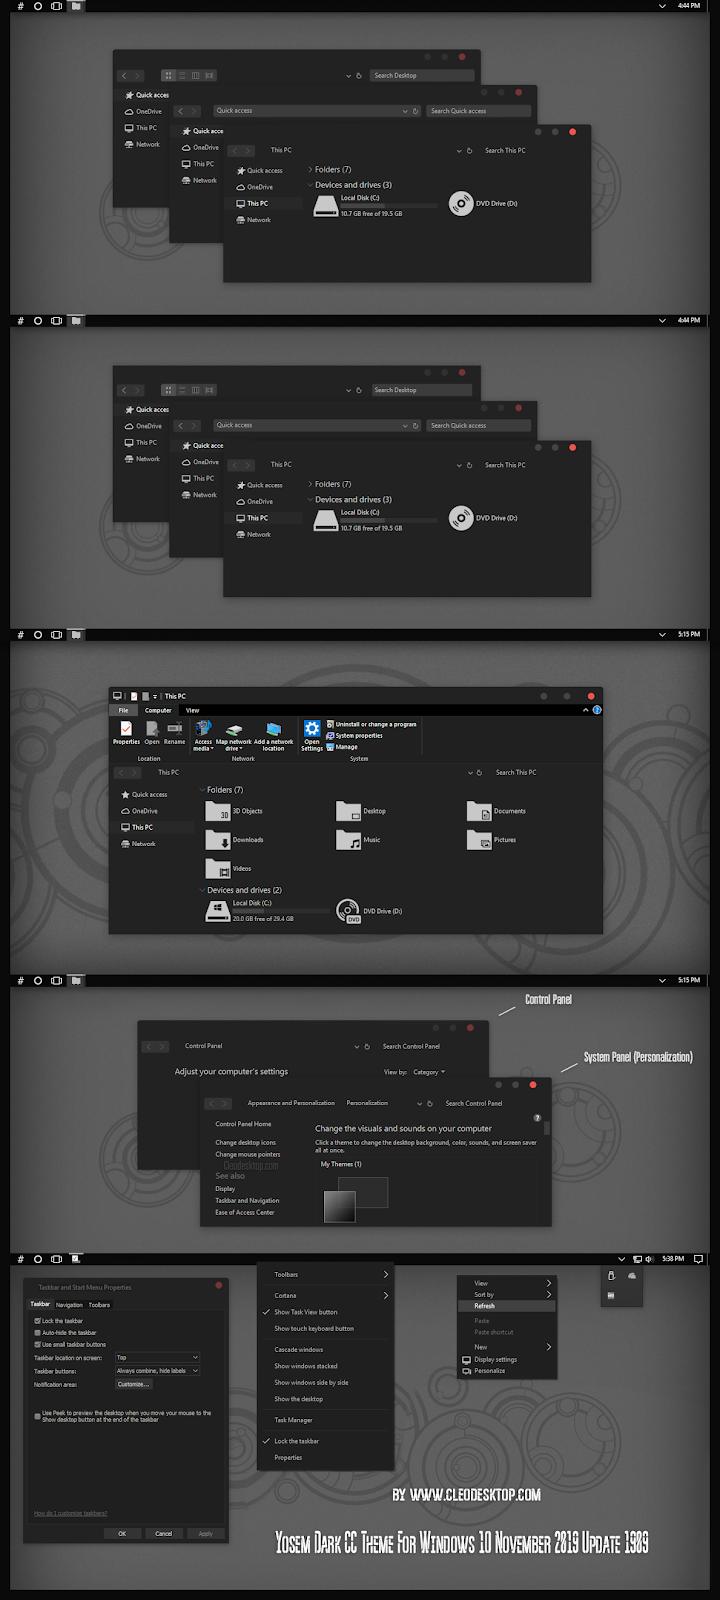 Yosem Dark CC Theme For Windows10 November 2019 Update 1909